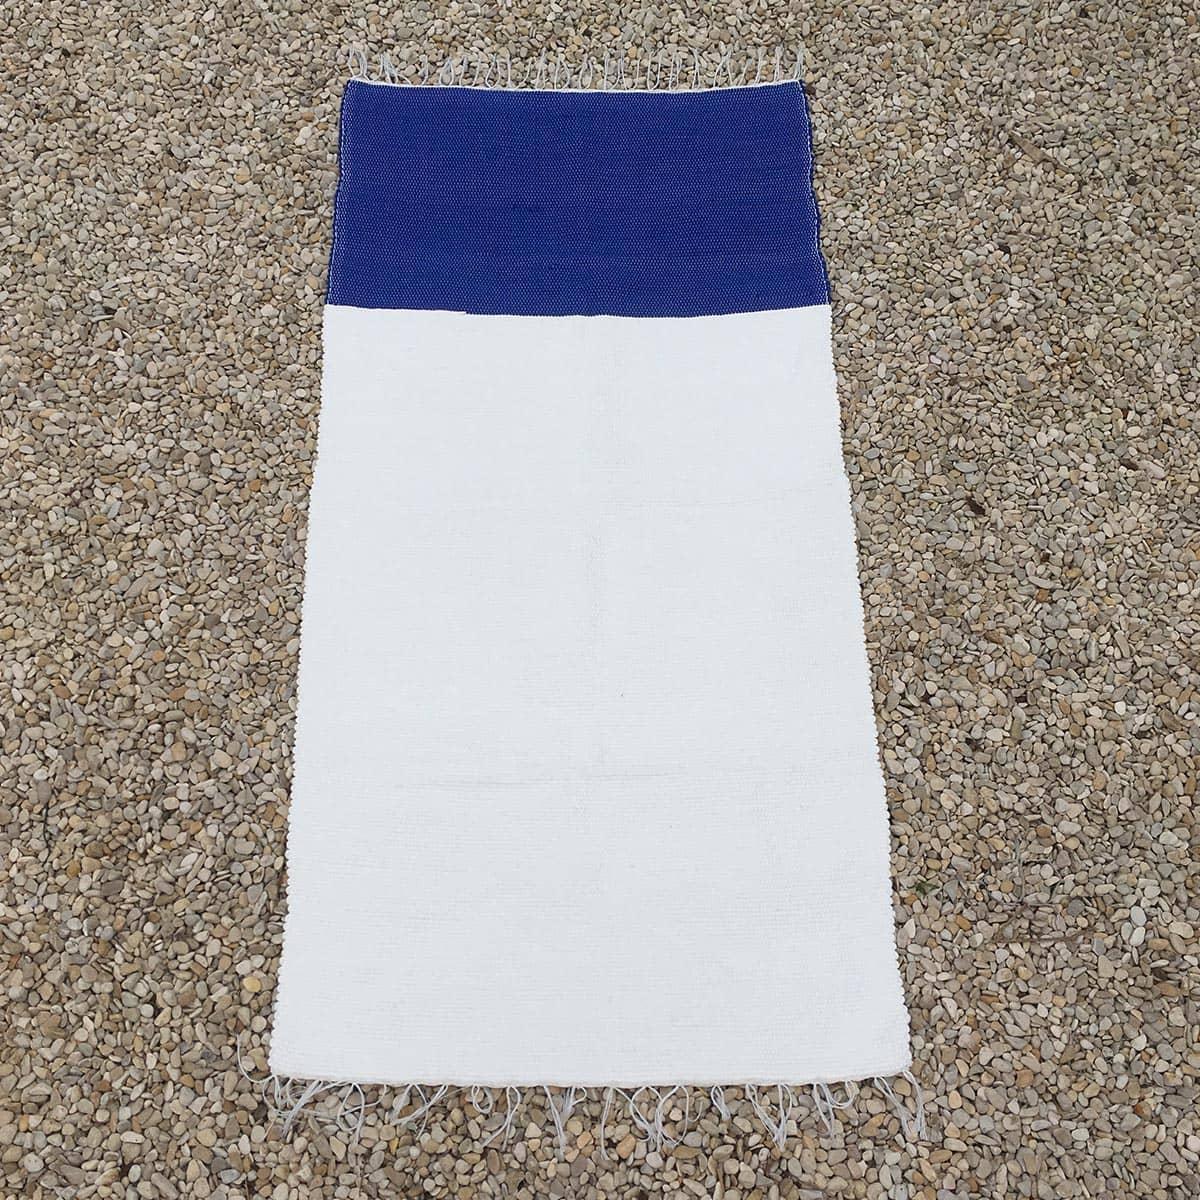 bicolor blauw - wit